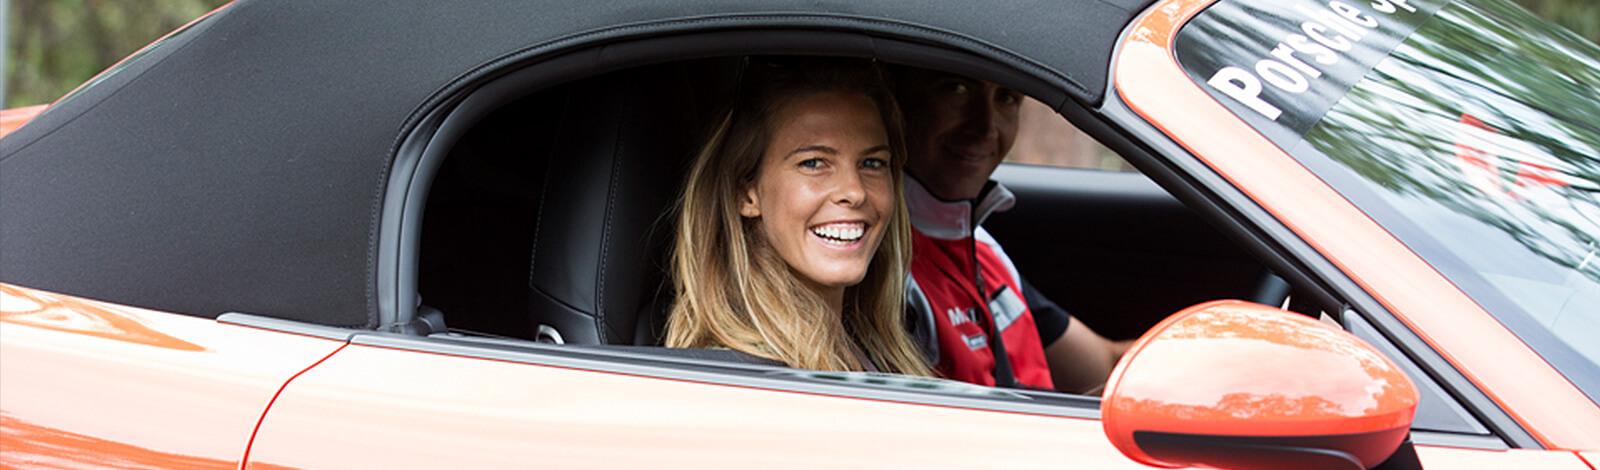 Porsche Brands New Ambassador Goautonews Premium